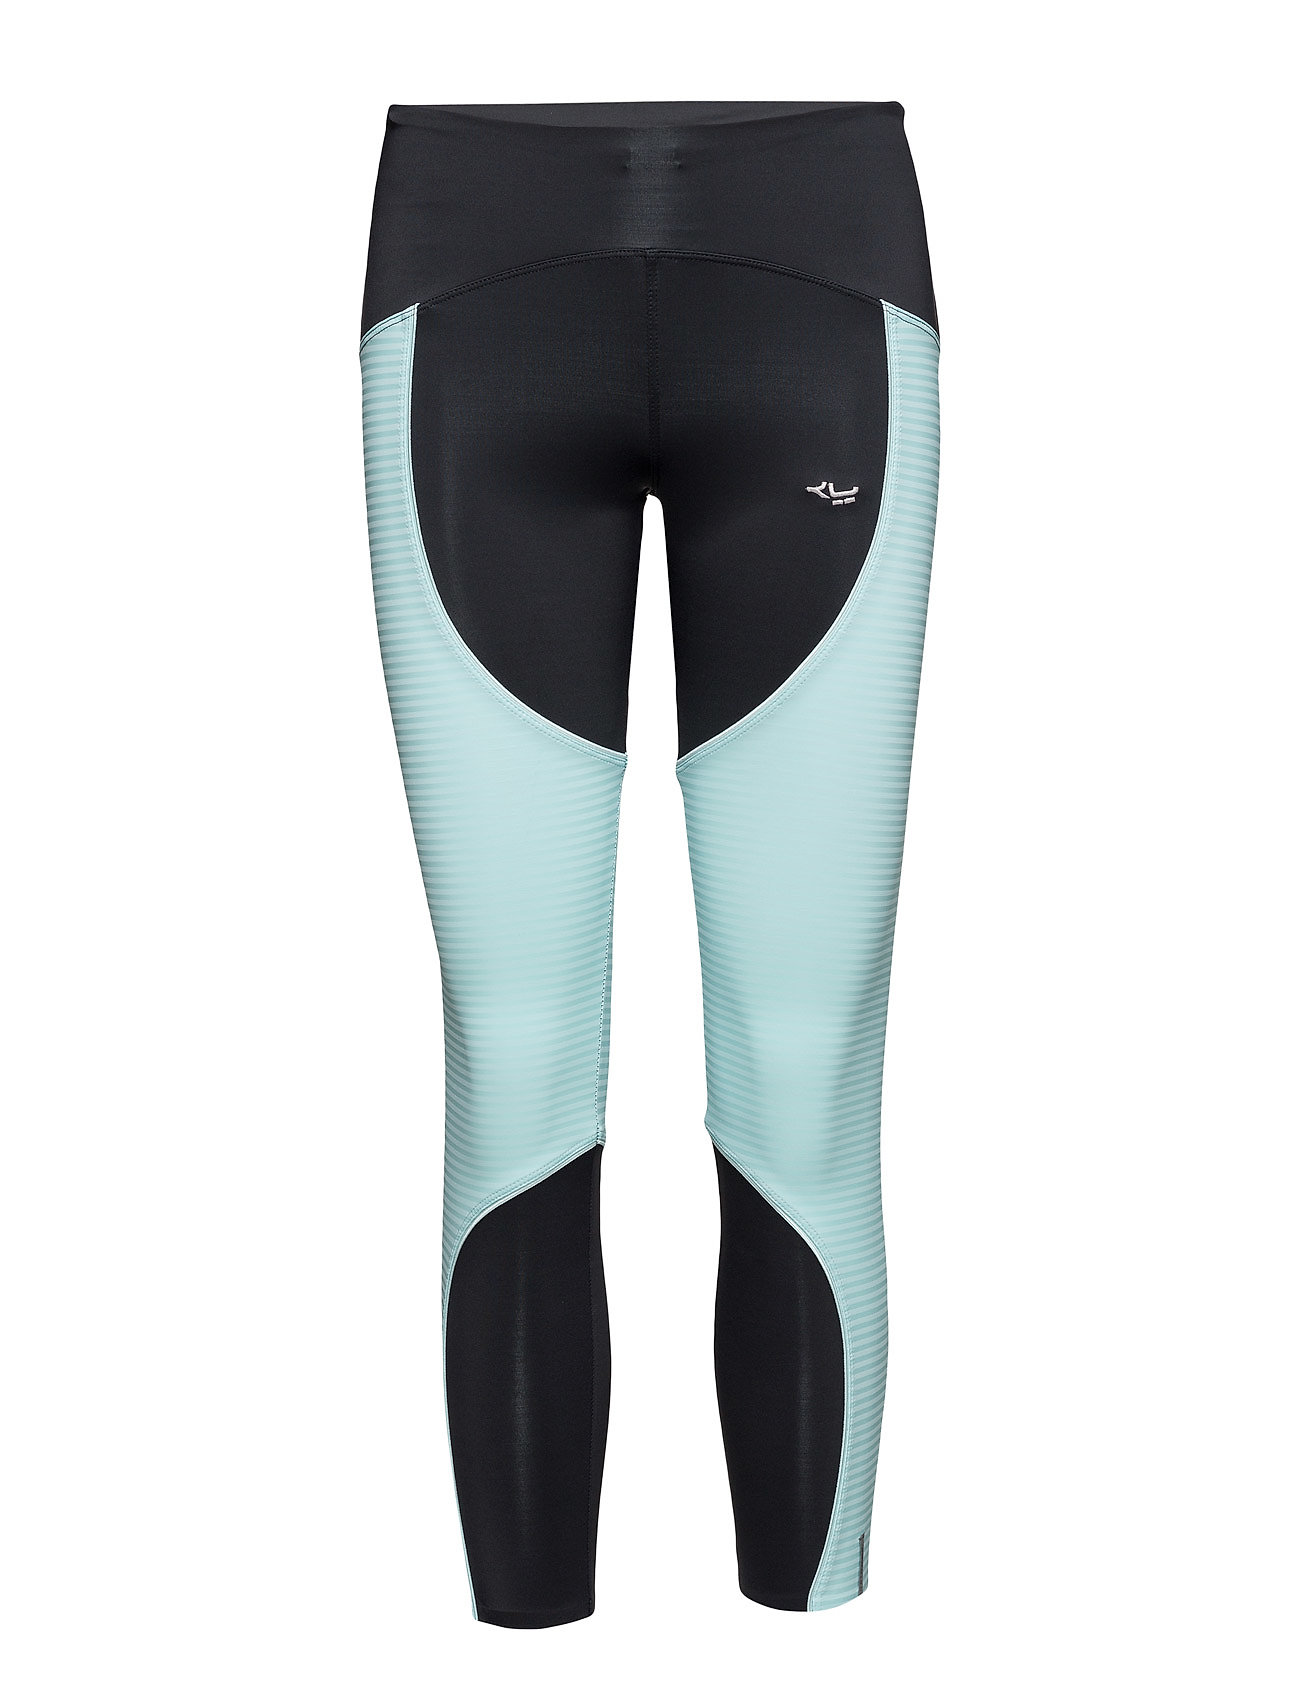 Shape Unni 7/8 Tight Röhnisch Trænings leggings til Damer i